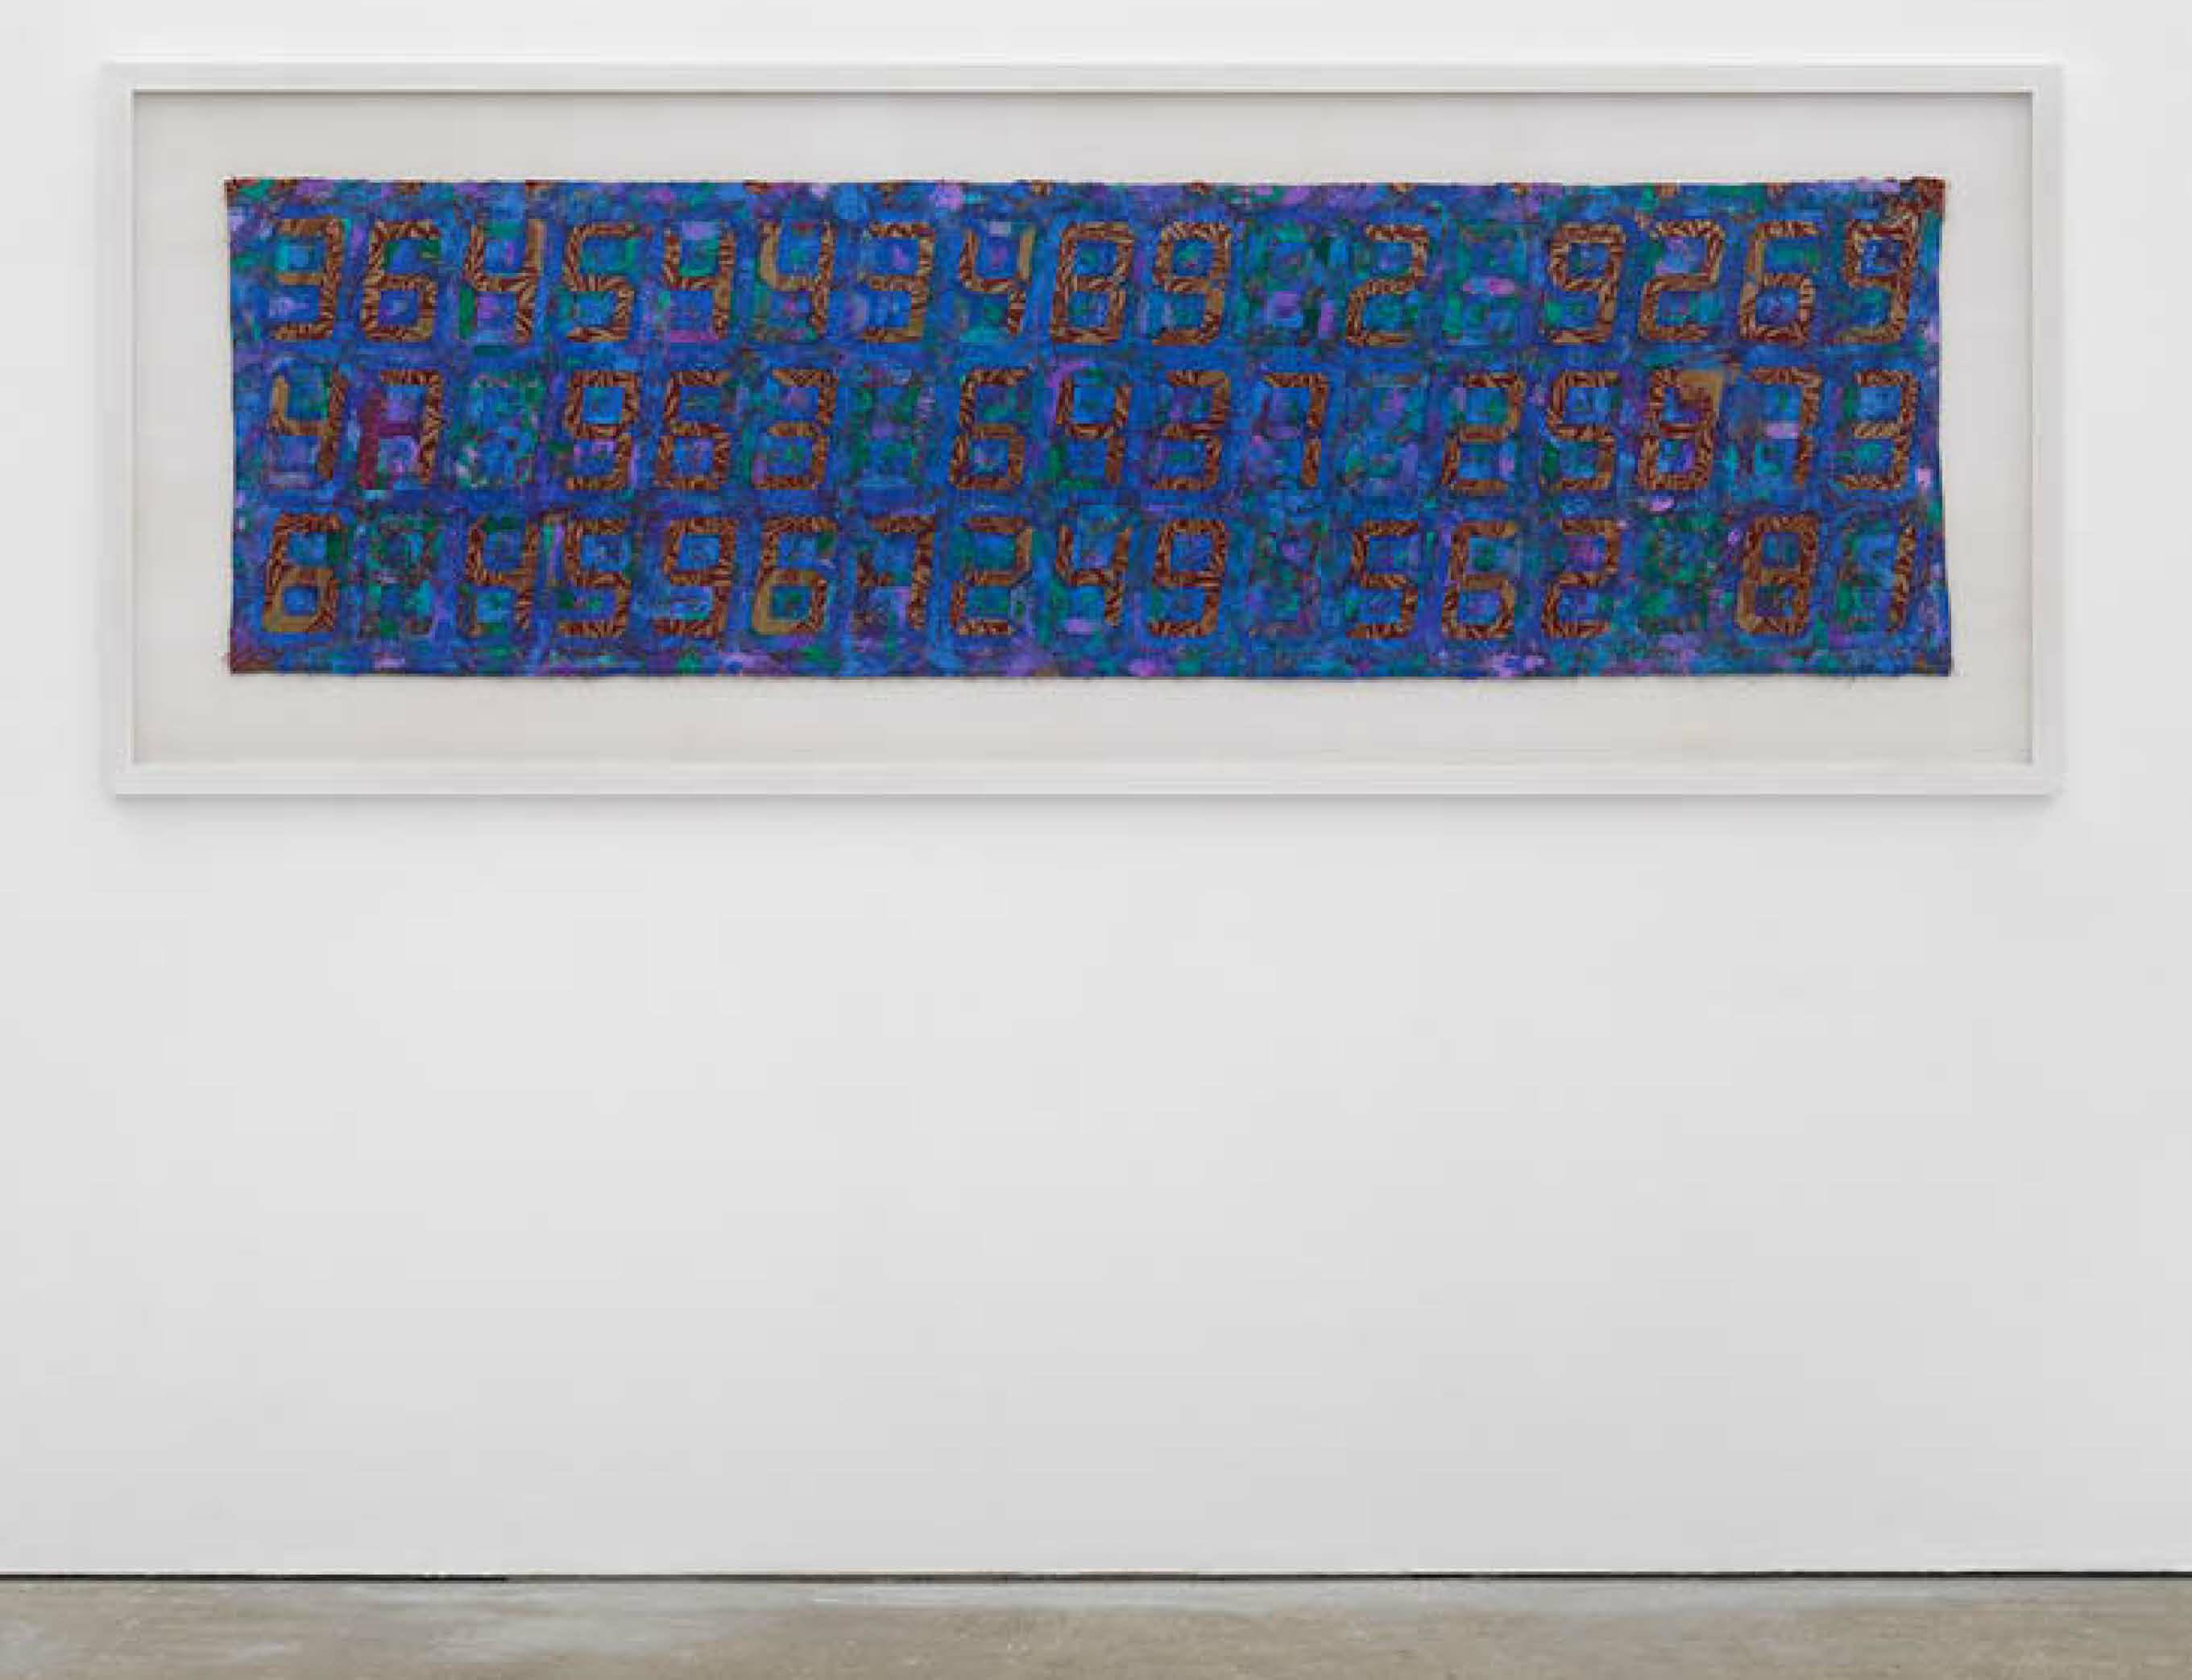 Tatsuo Miyajima presents new work at William Morris Gallery, London